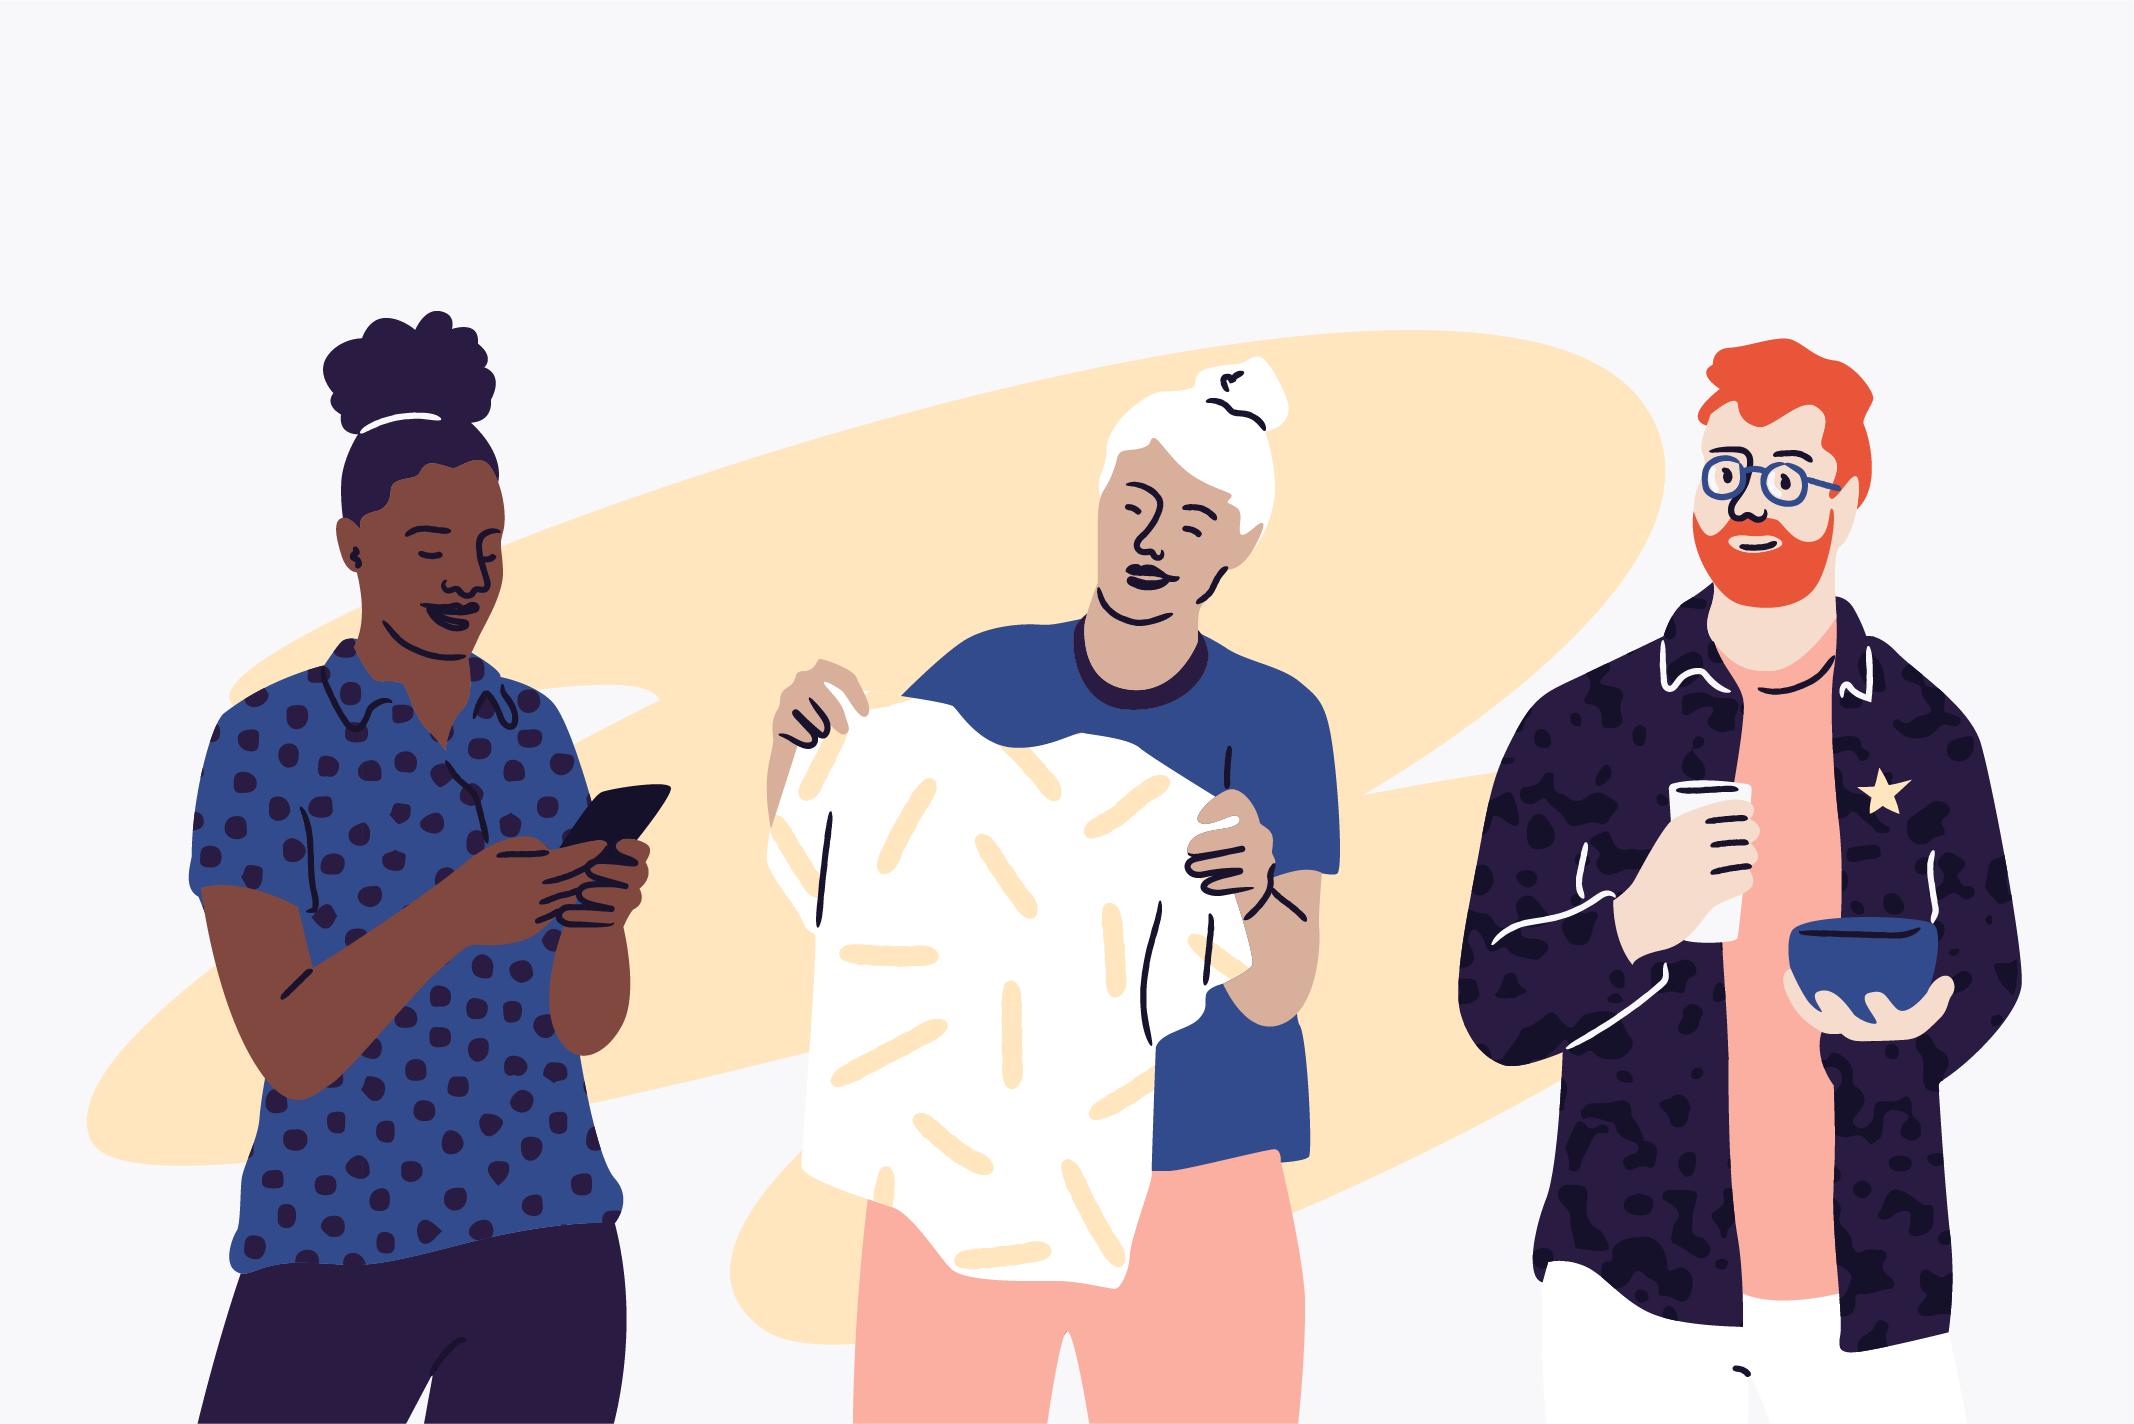 community event ideas